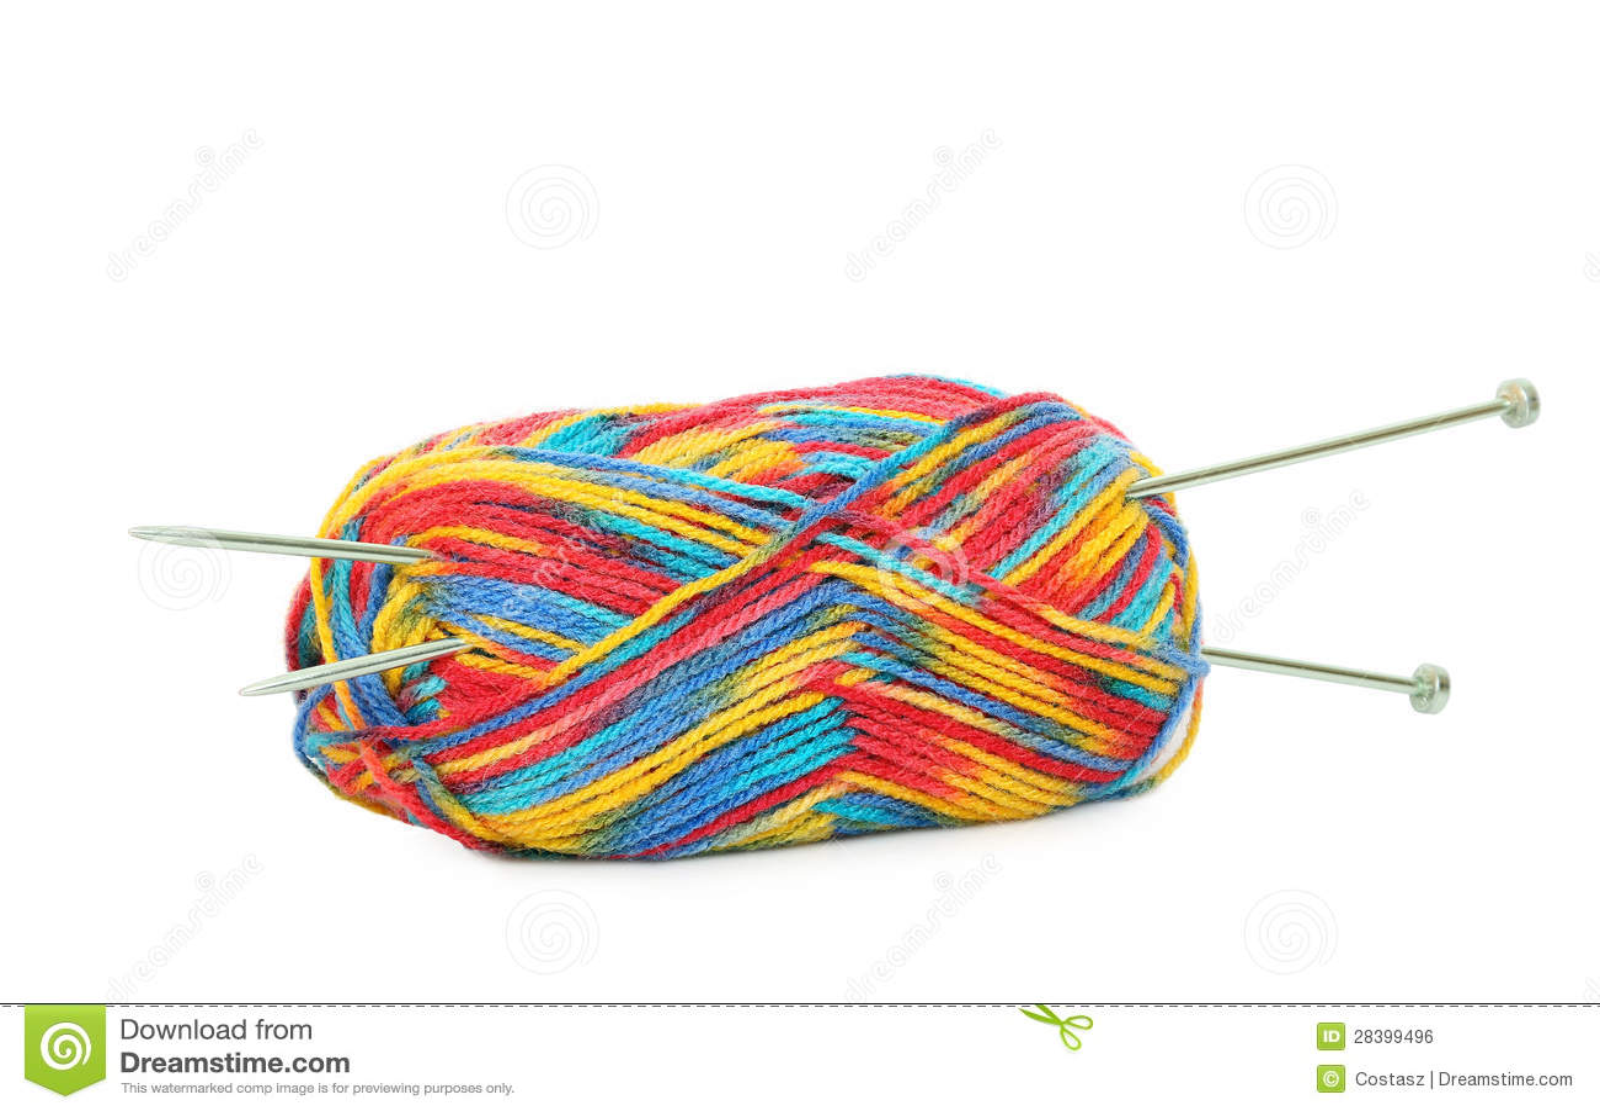 Yarn Ball Clip Art Free